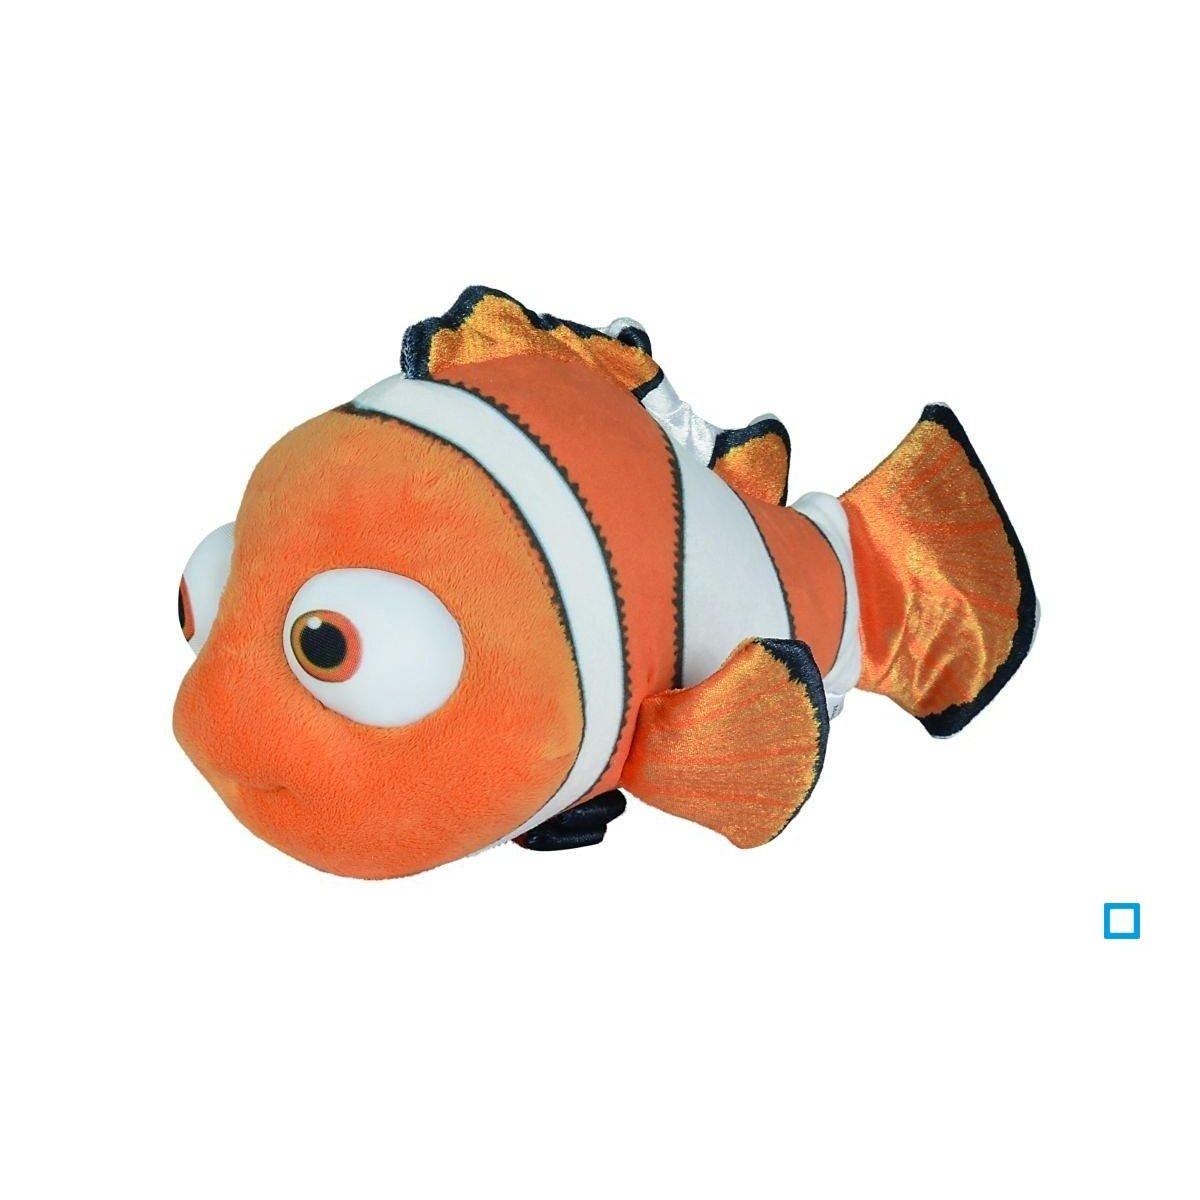 Le Monde de Dory - Peluche Nemo 25 cm - SIM5871742